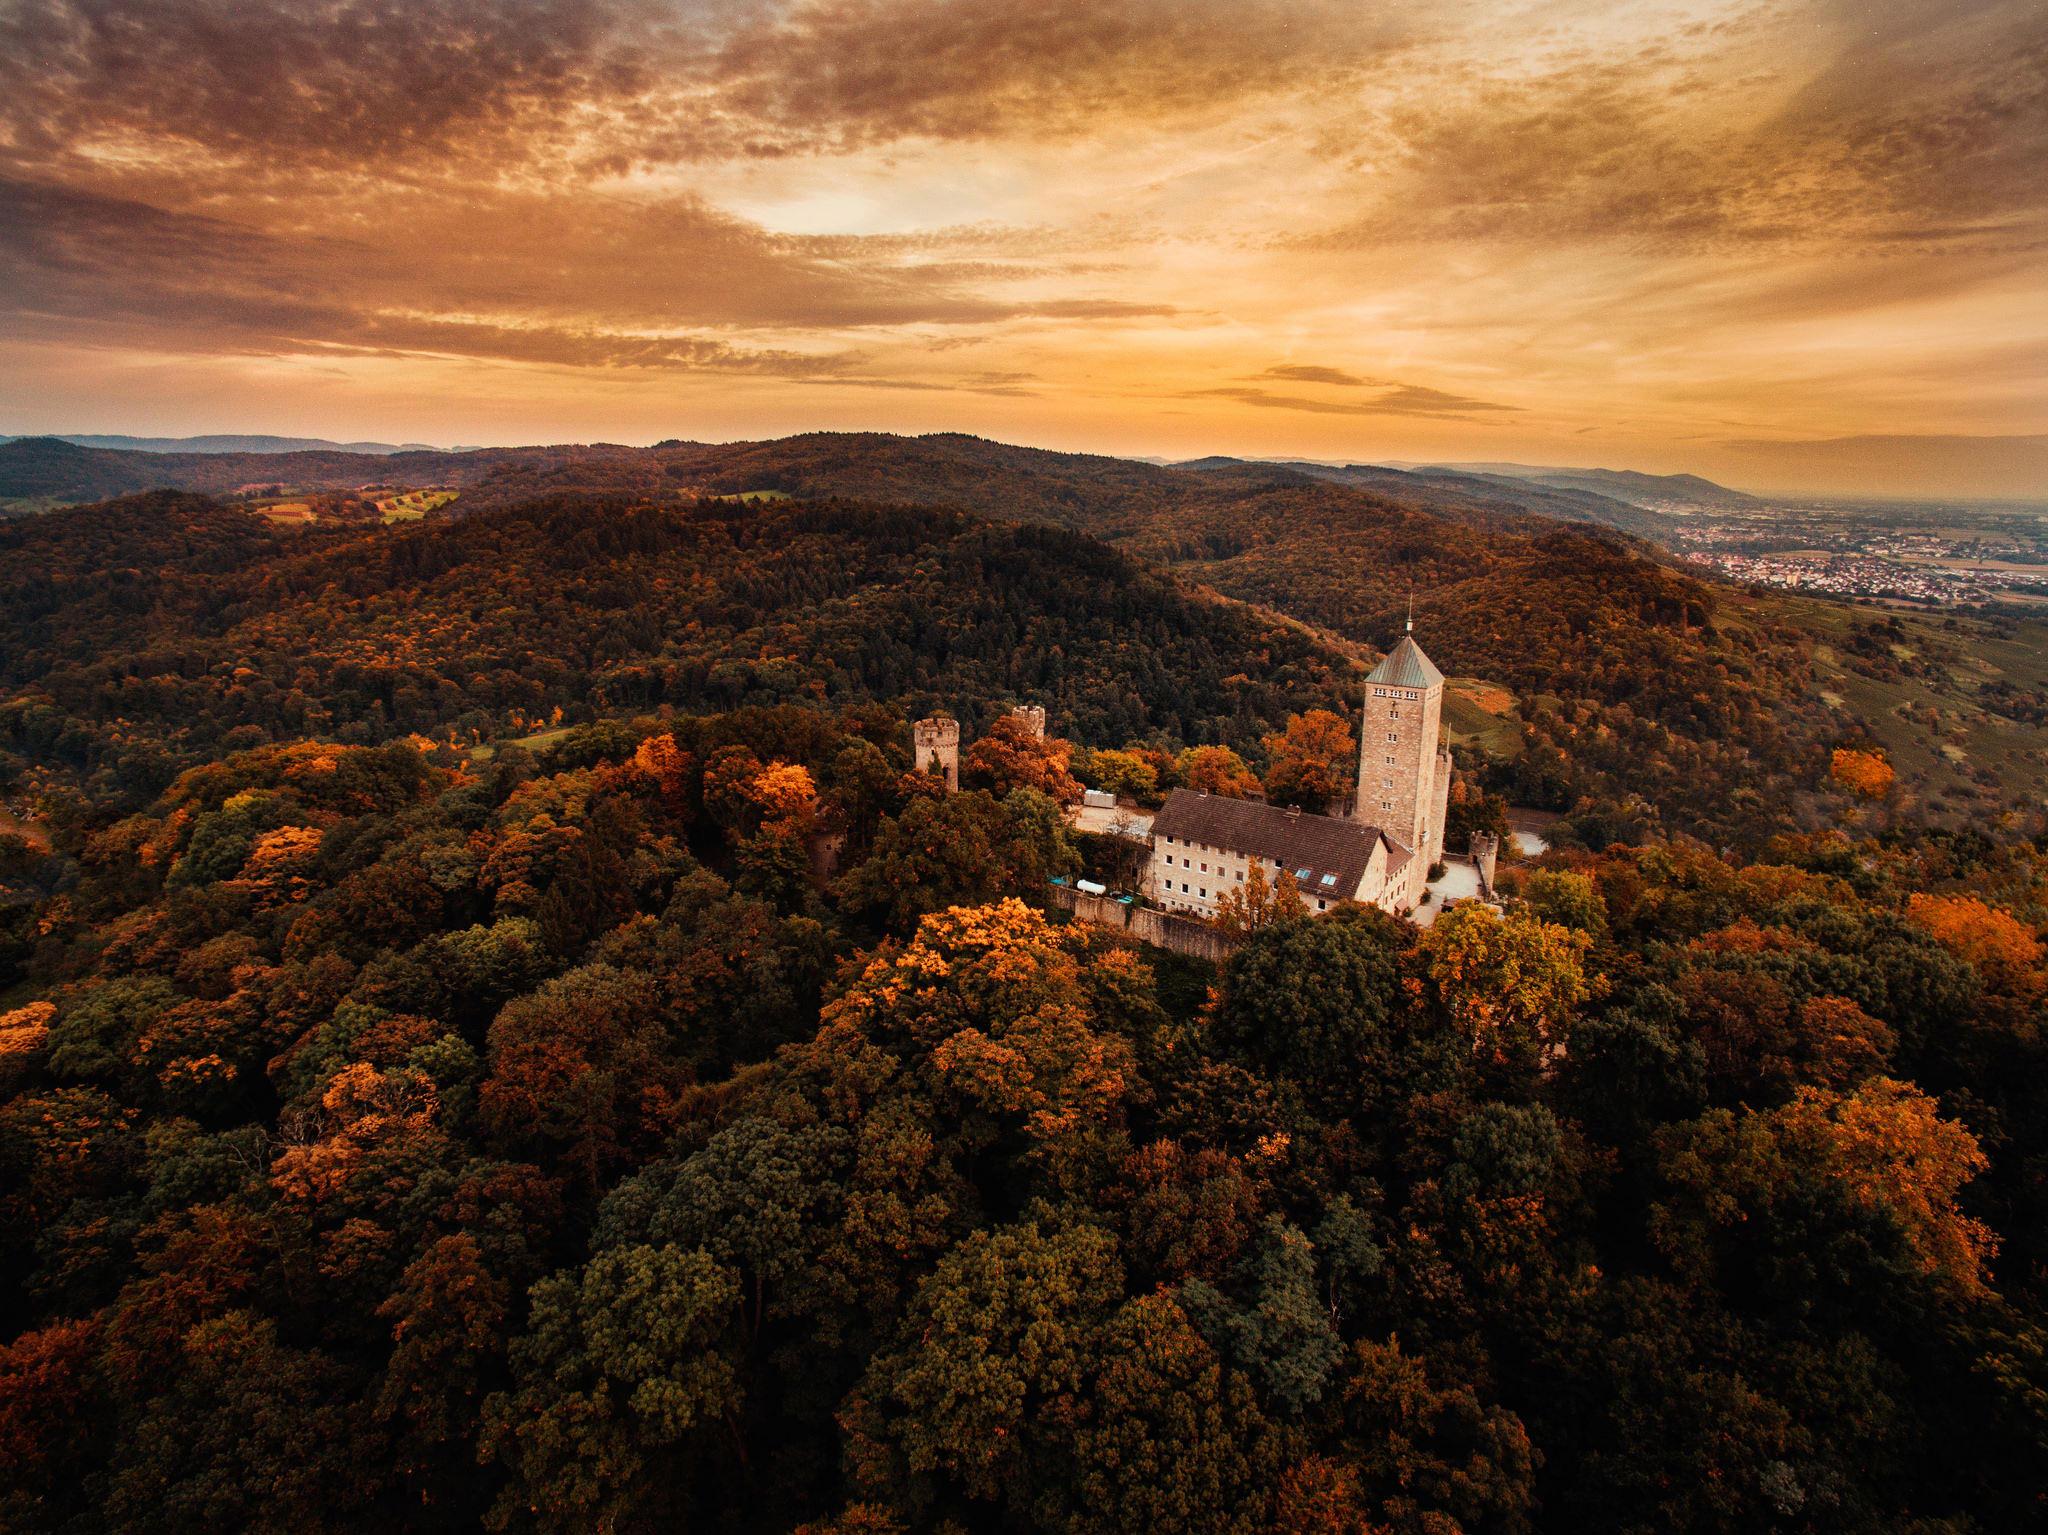 Landschaftsfotografie fotograf filmemacher frankfurt patrick schmetzer drohne landschaft natur 9